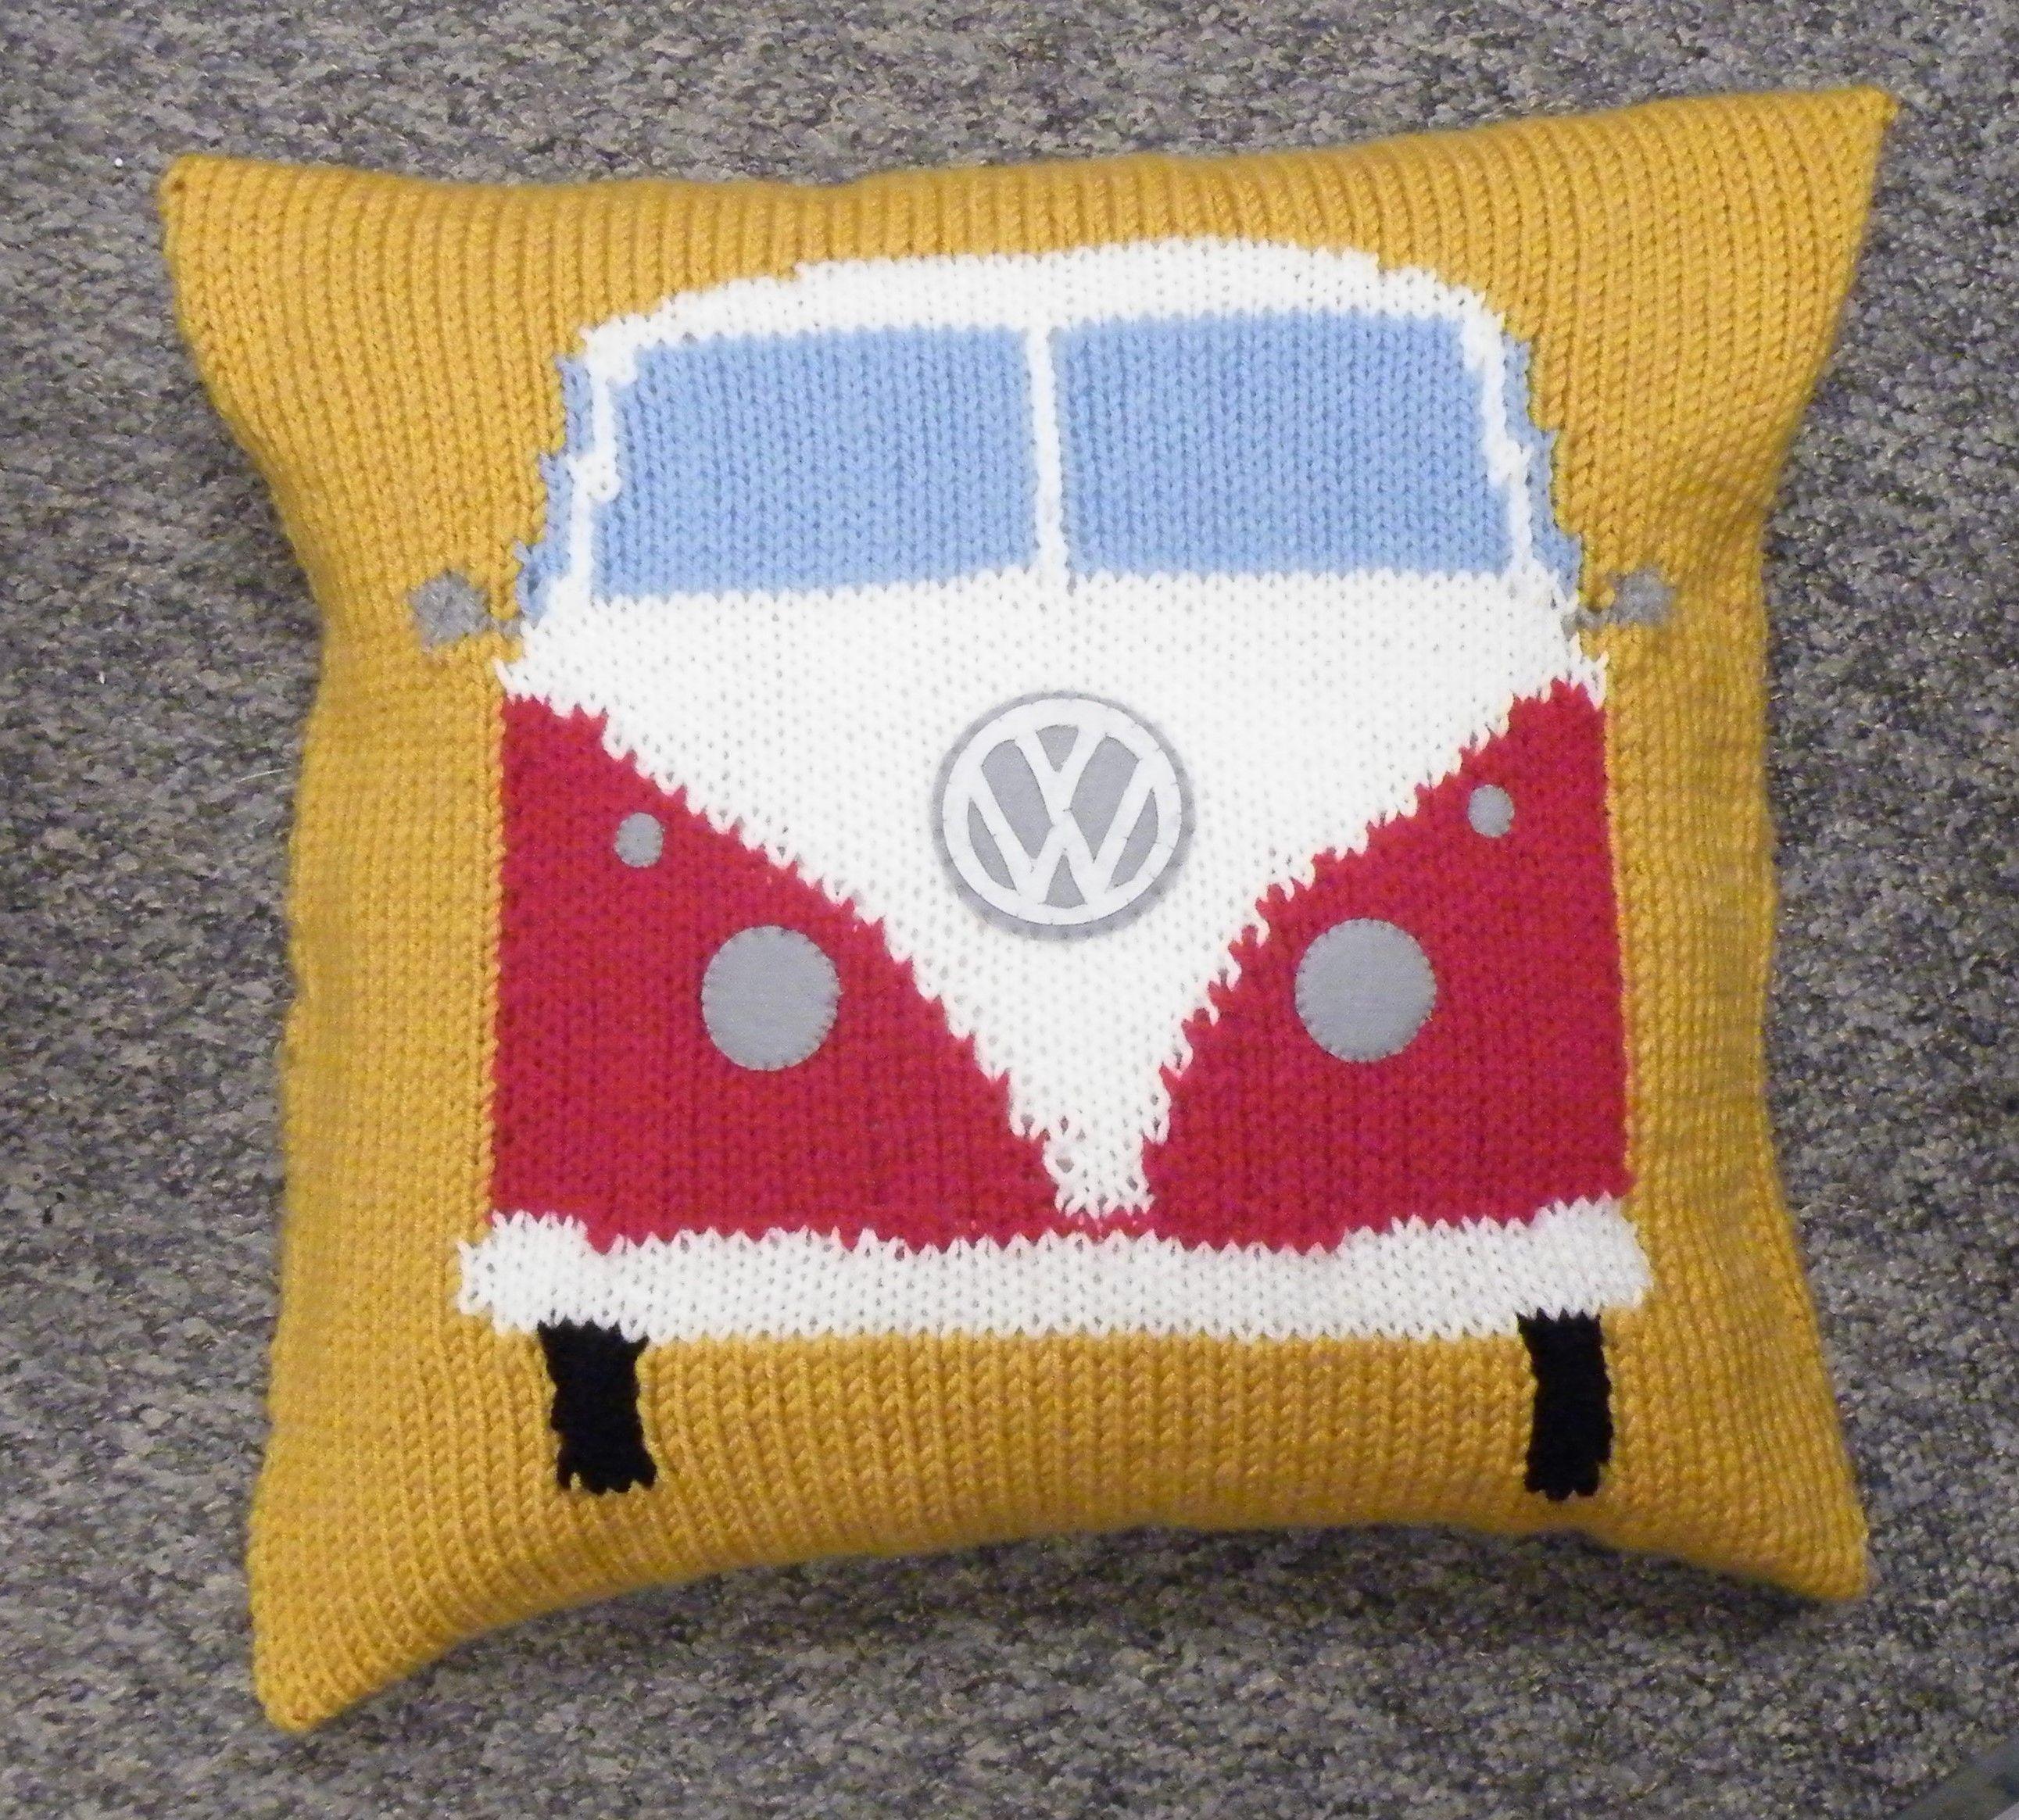 V W camper van cushion. Please go to my etsy shop